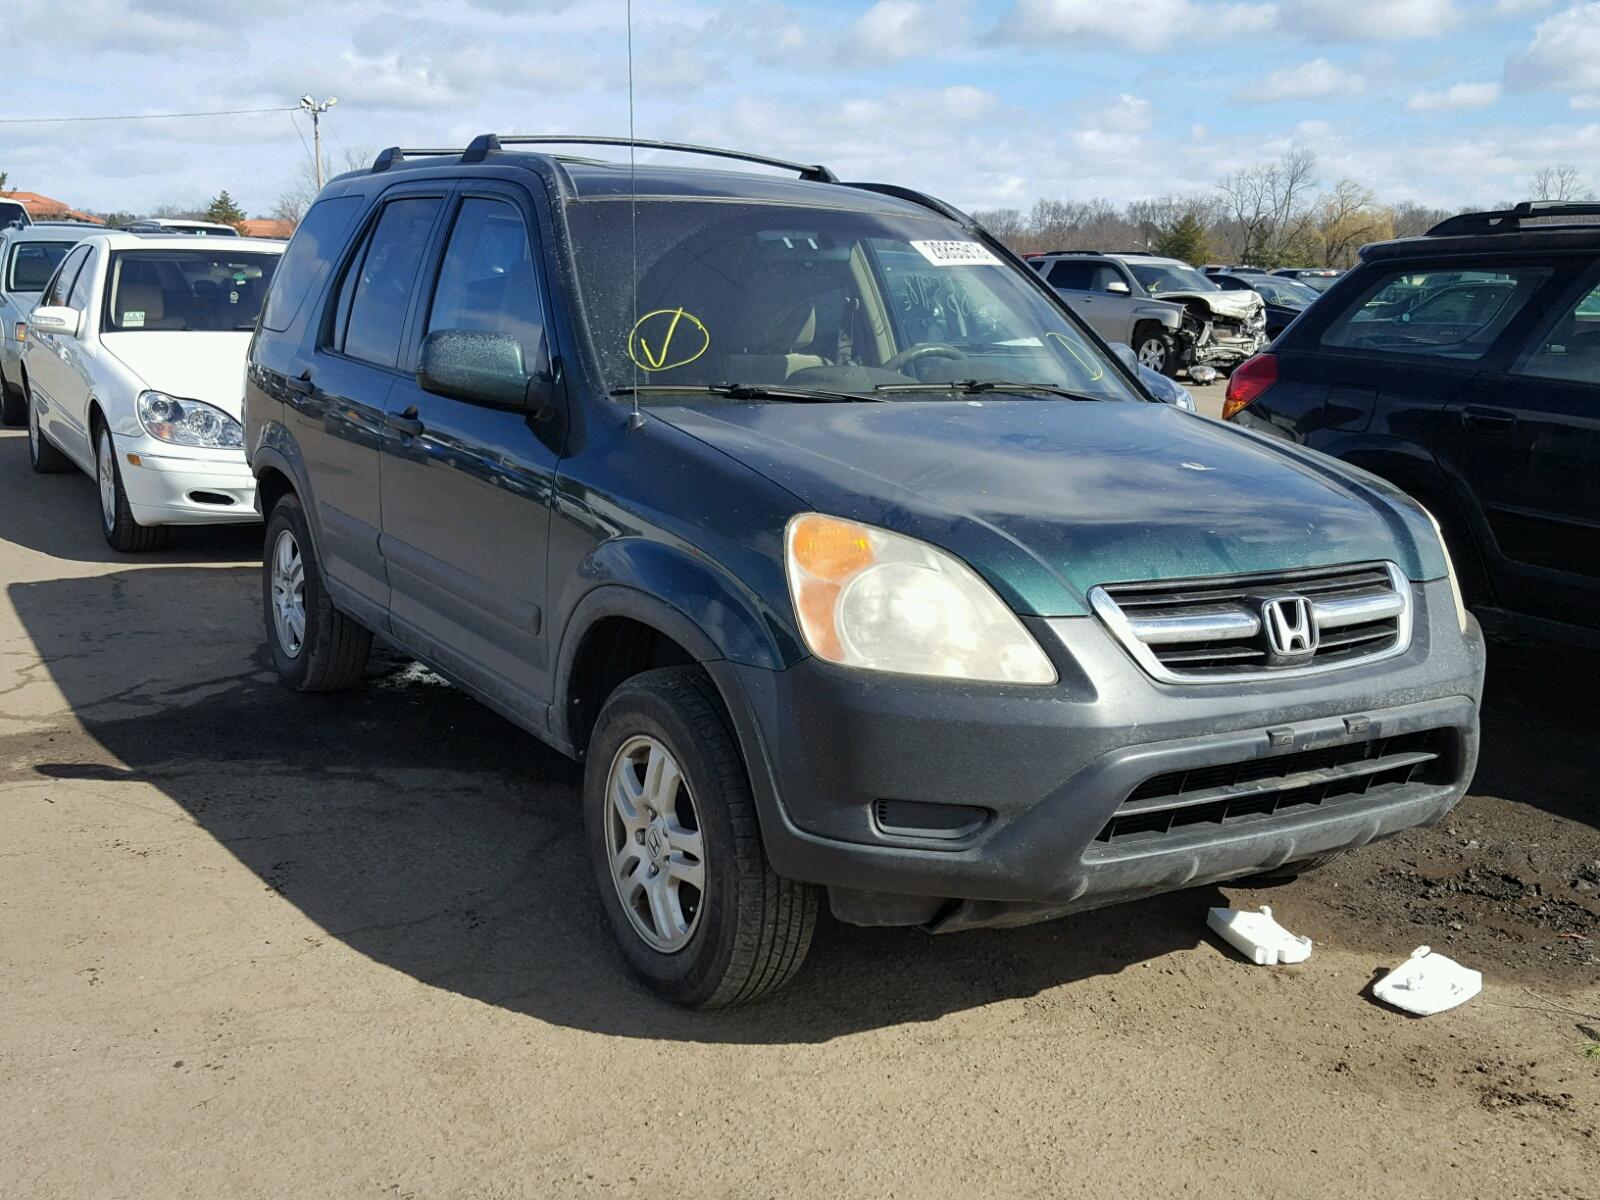 Shsrd78863u148988 2003 Green Honda Cr V Ex On Sale In Ct 24l Left View